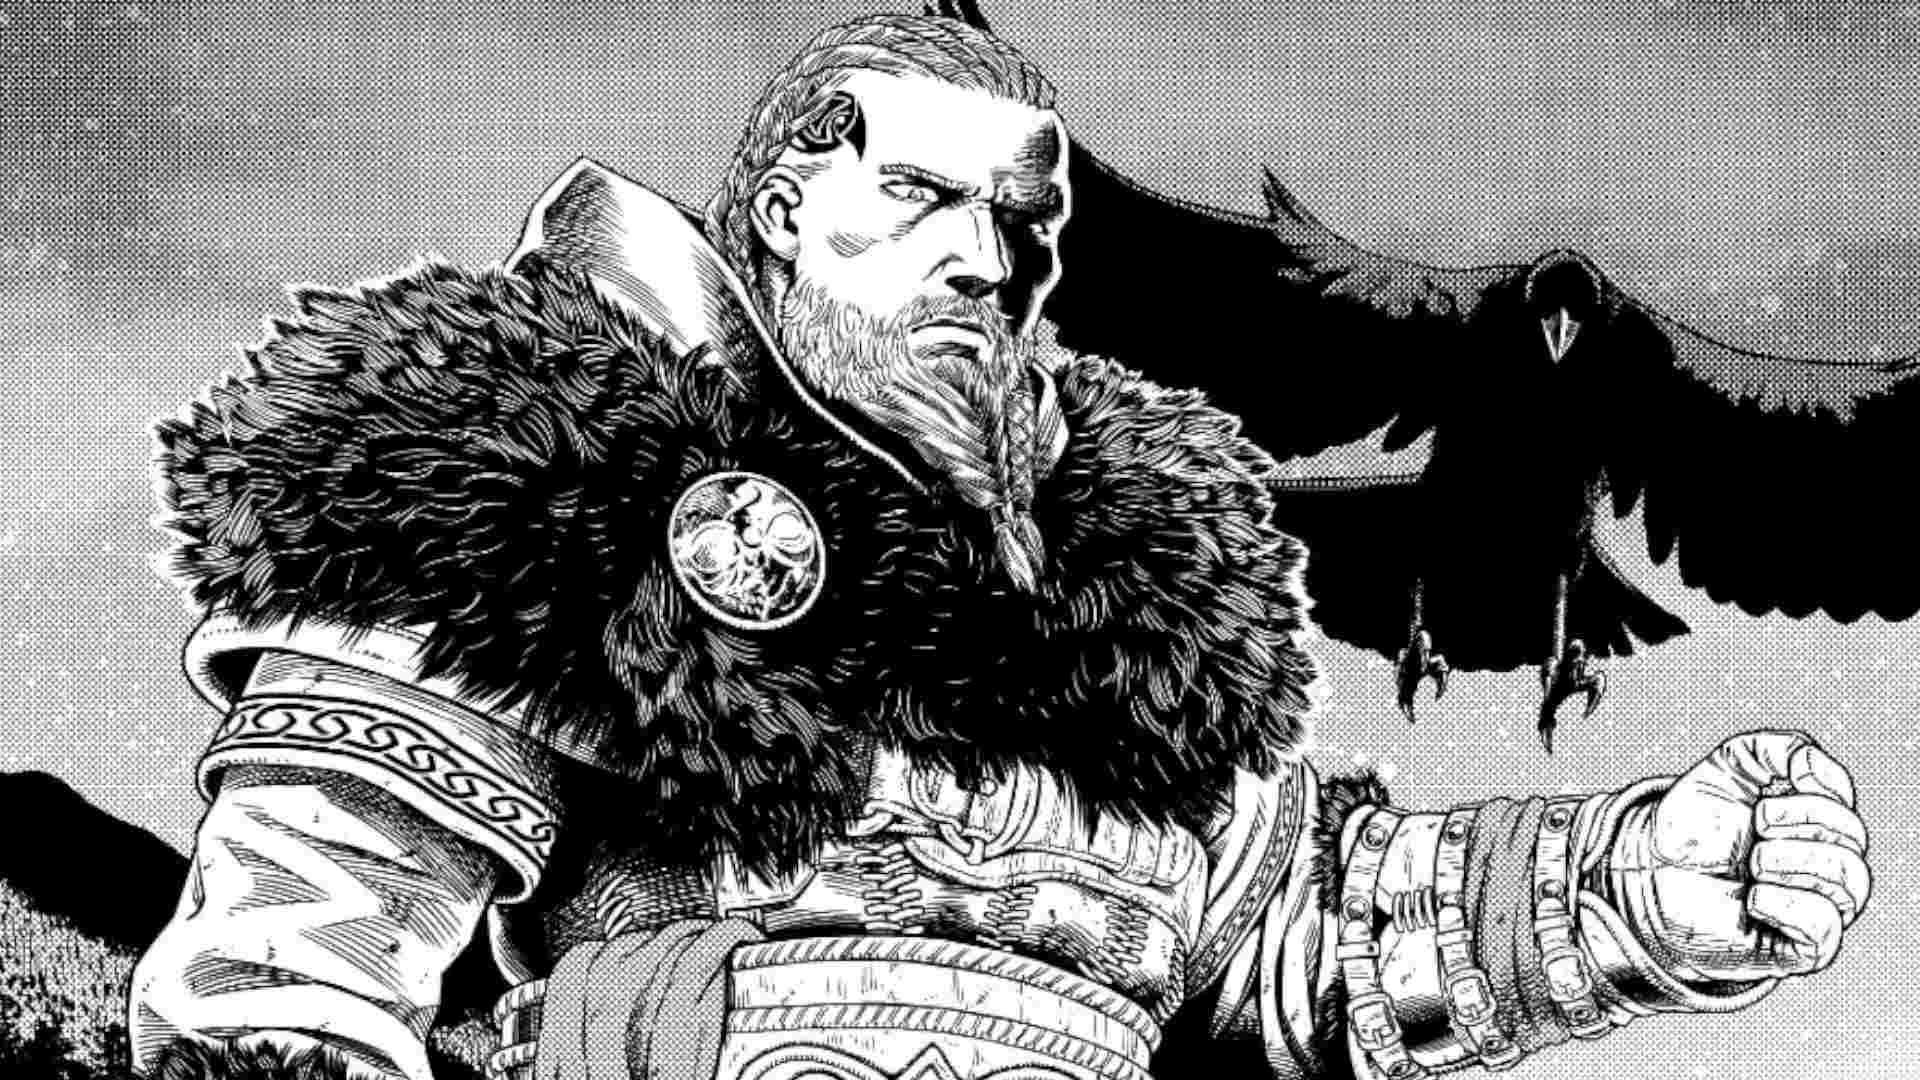 assassins creed valhalla manga vinland saga